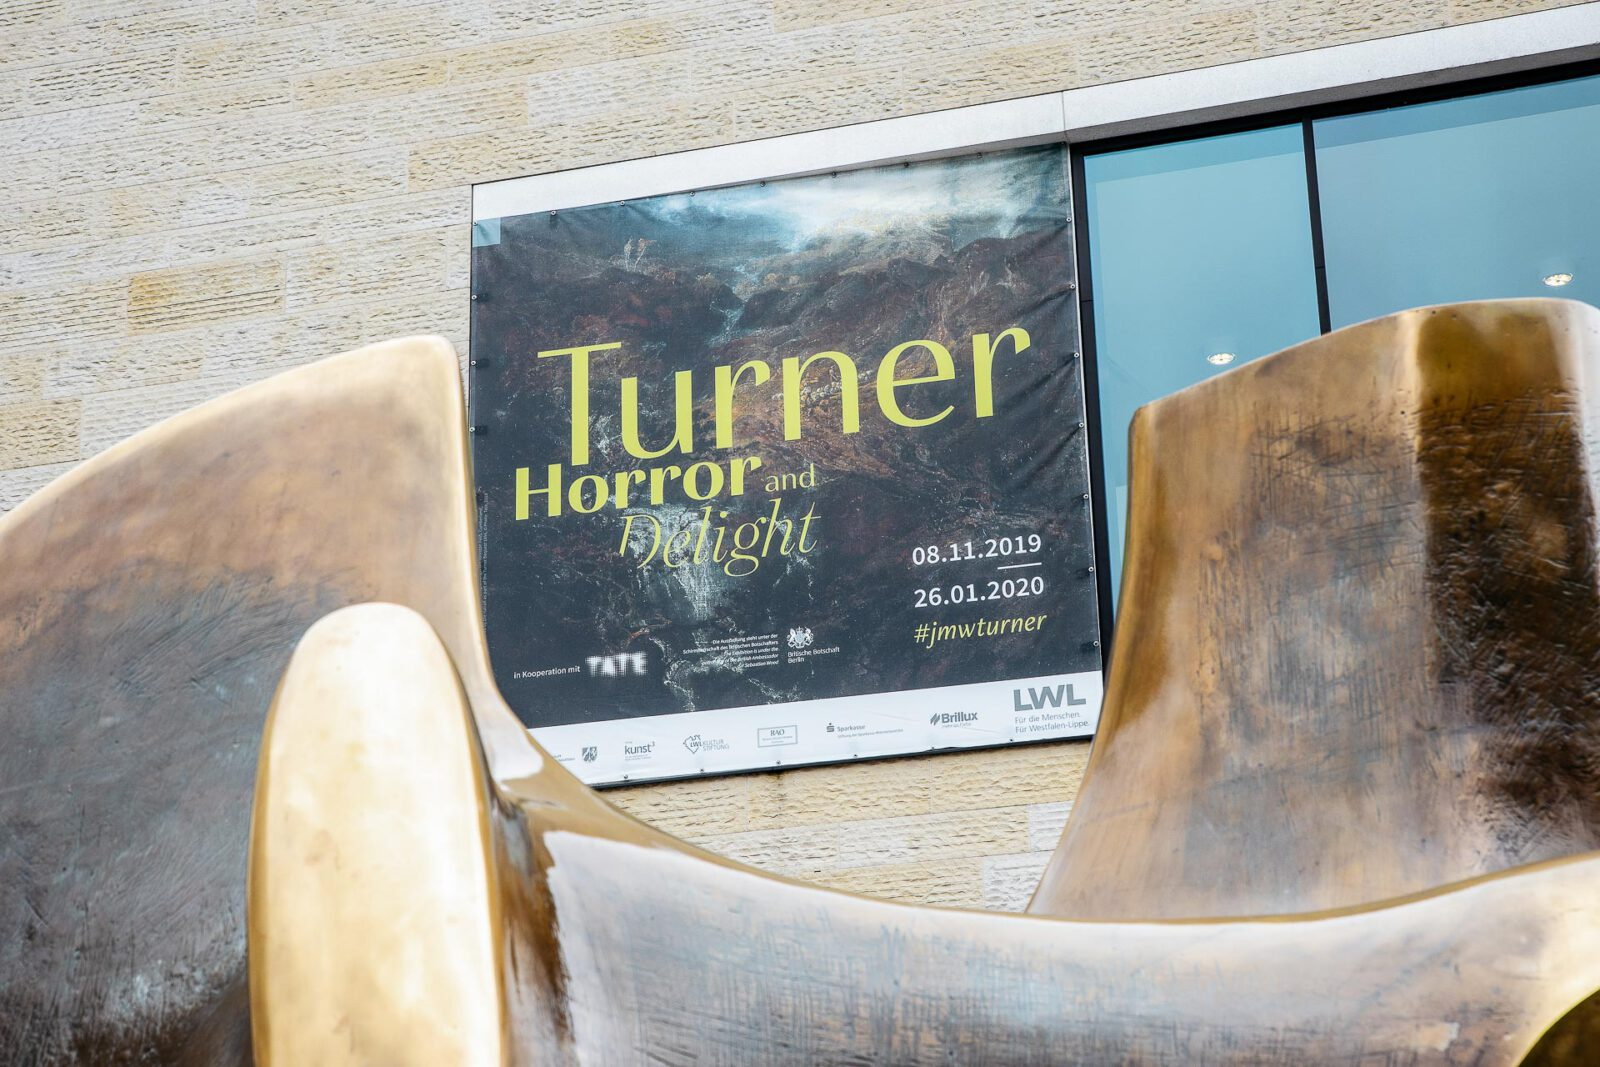 1_S_Turner_Plakate_15-11-2019_TE_9828